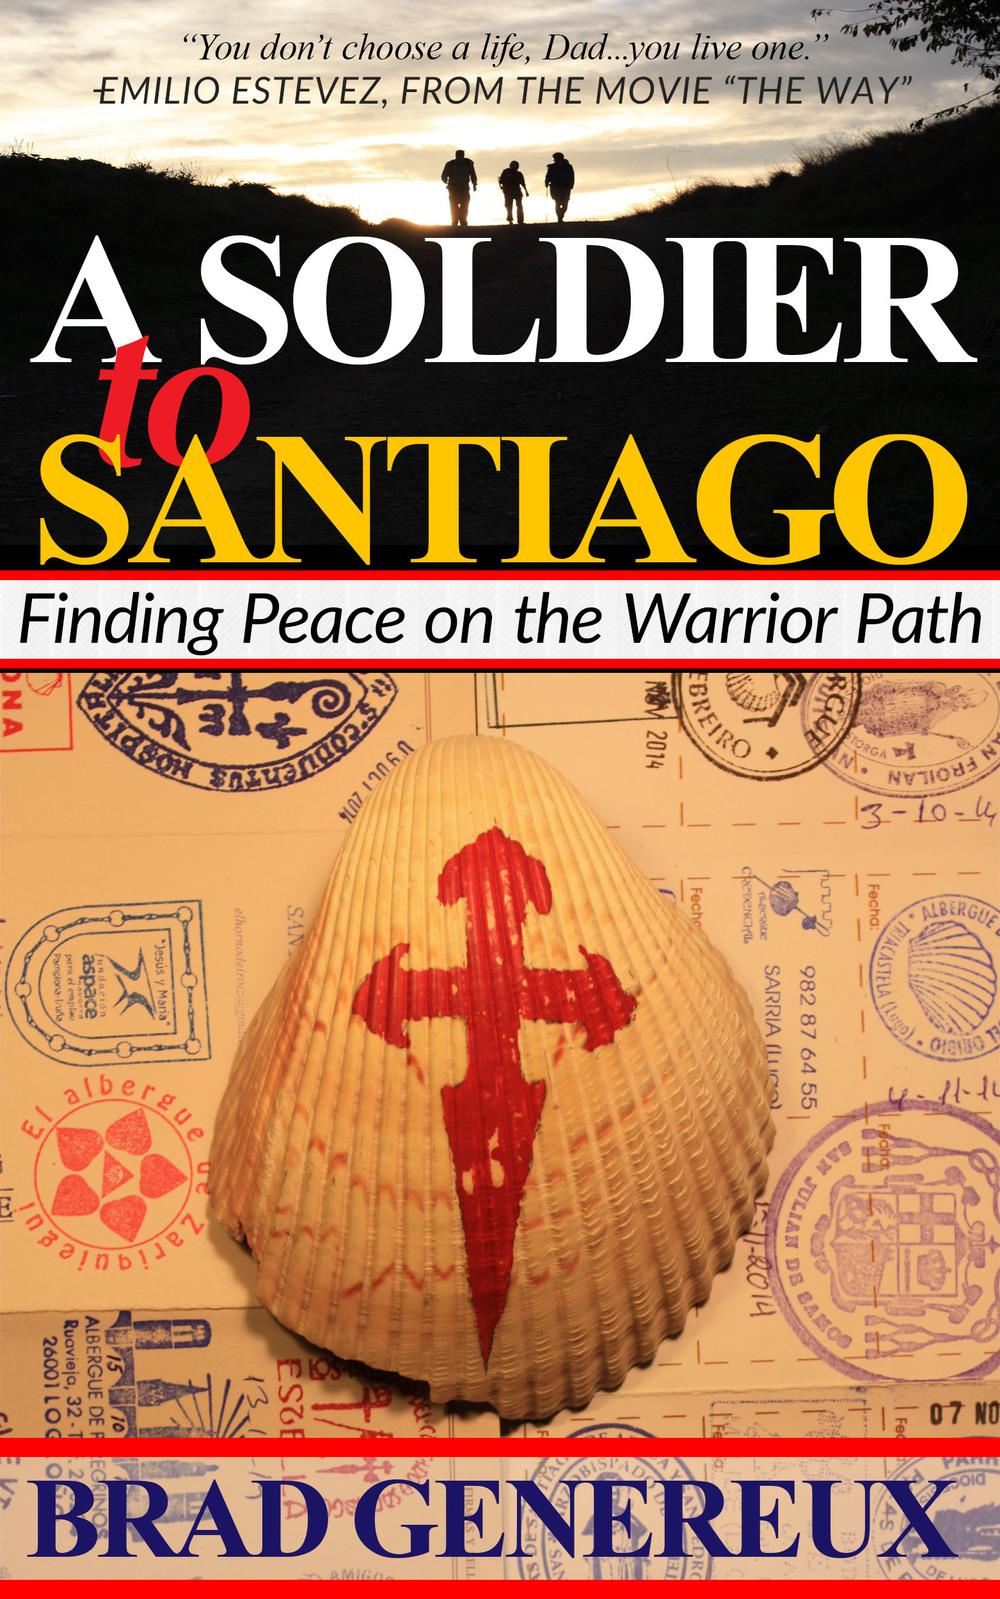 Soldier to Santiagoredlines.jpg